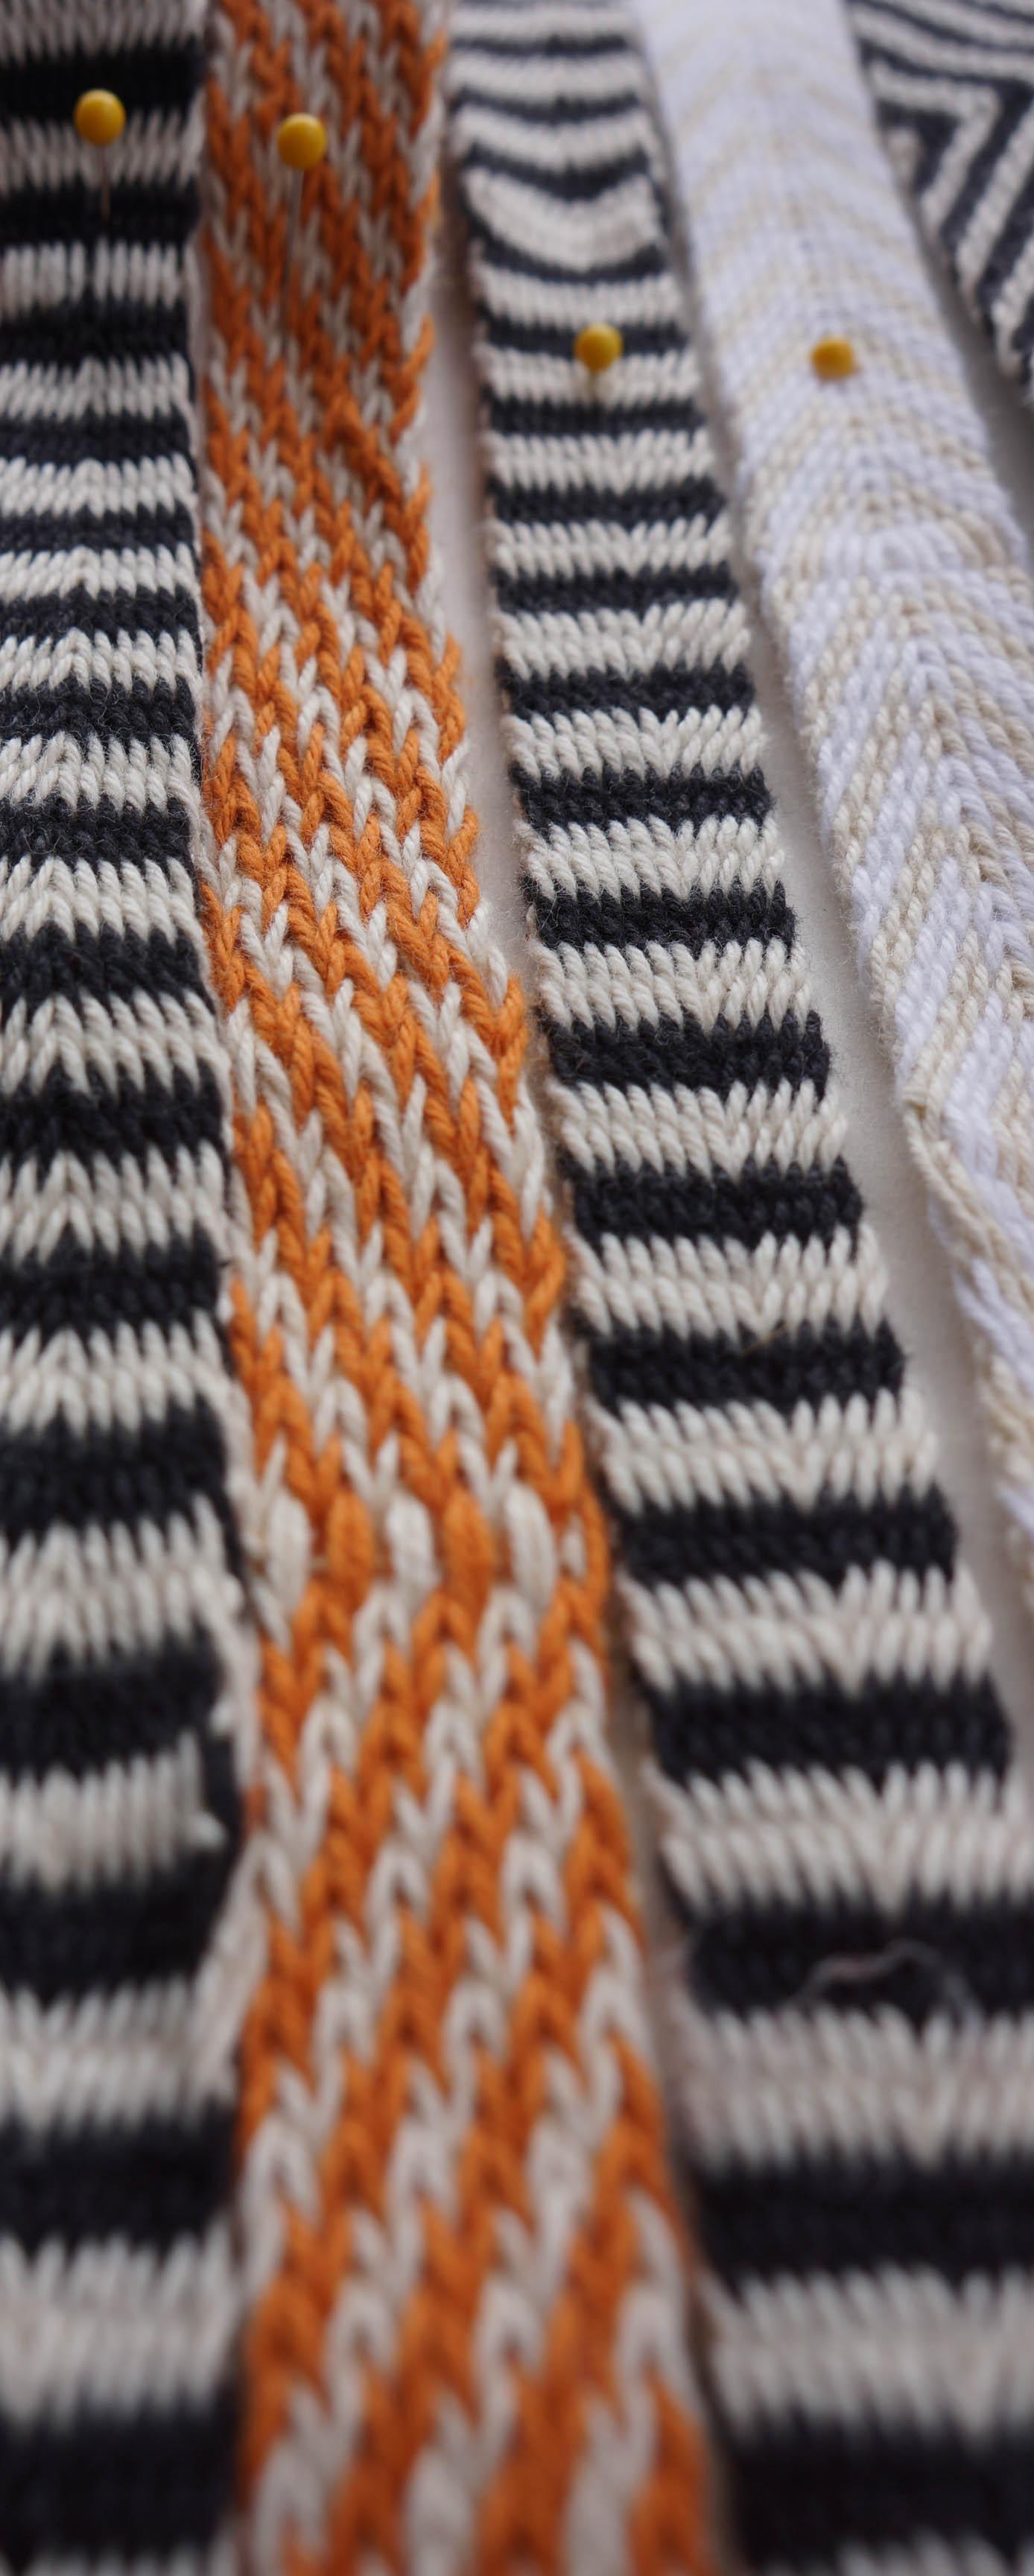 Catherine Reinhart_ Computation and Weaving